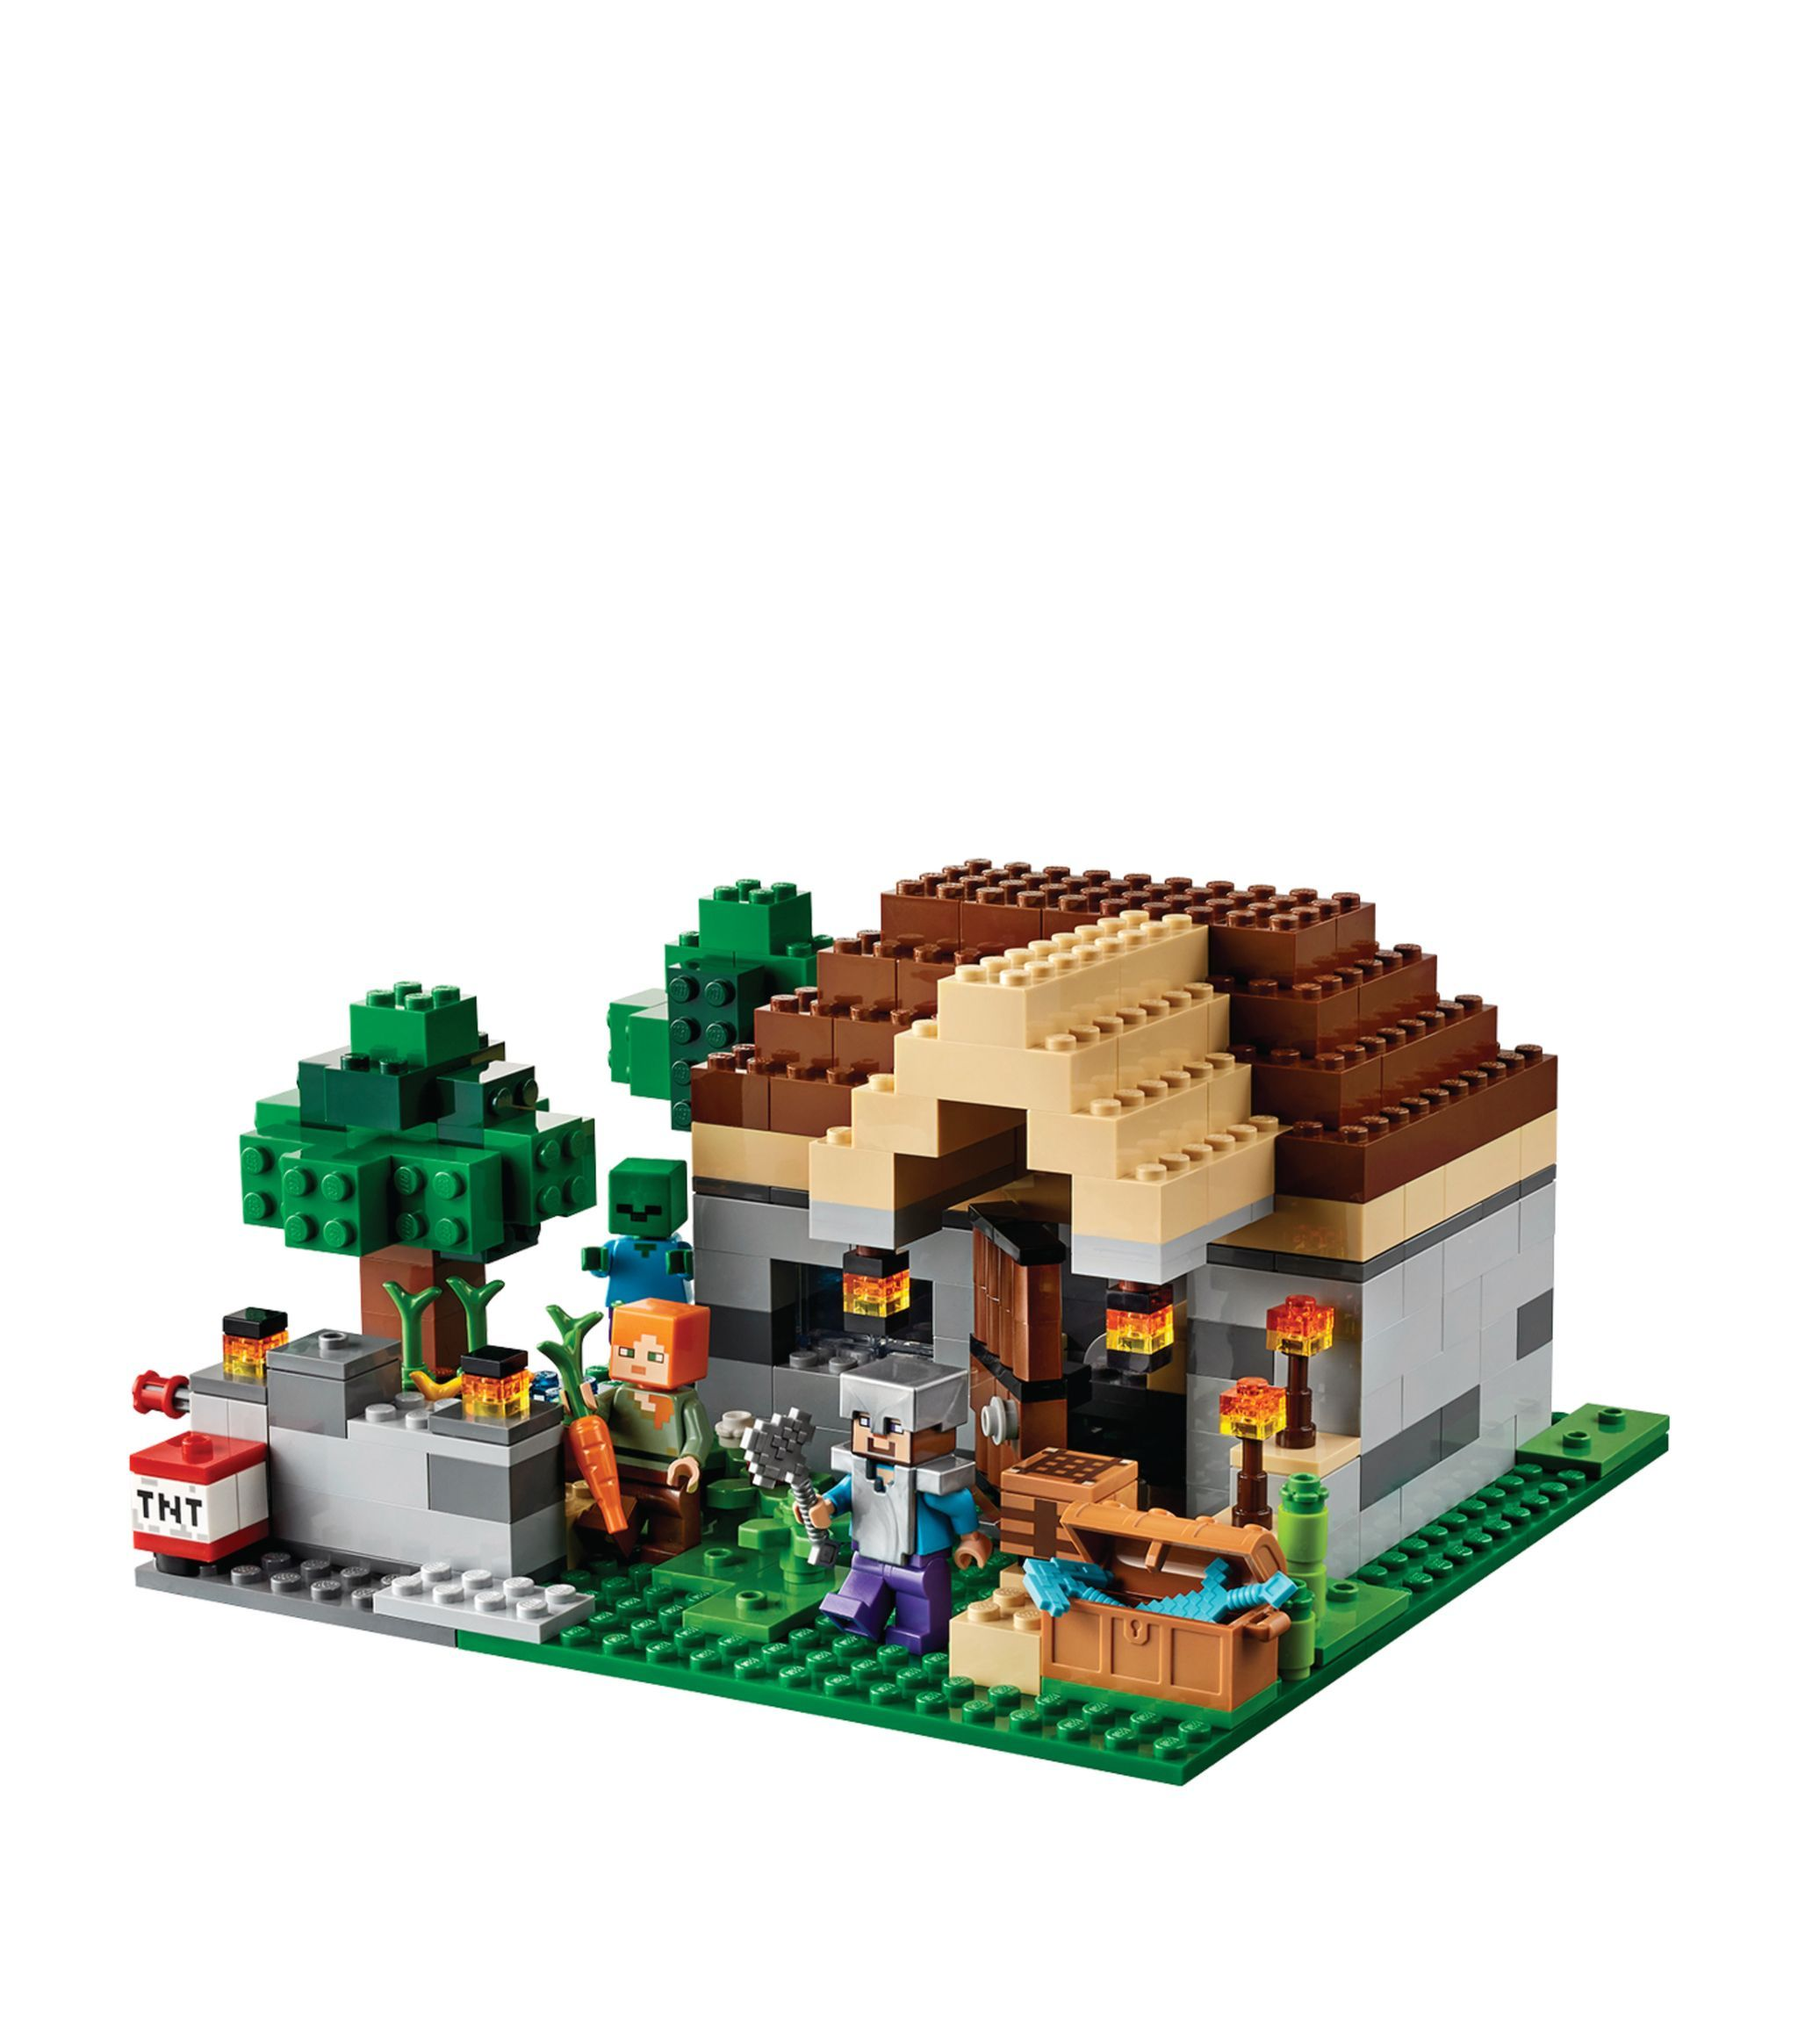 Lego Minecraft The Crafting Box 3 0 Set Harrods Cn Ad Sponsored Crafting Box Lego Minecraft Harrods In 2020 Craft Box Lego Minecraft Crafts